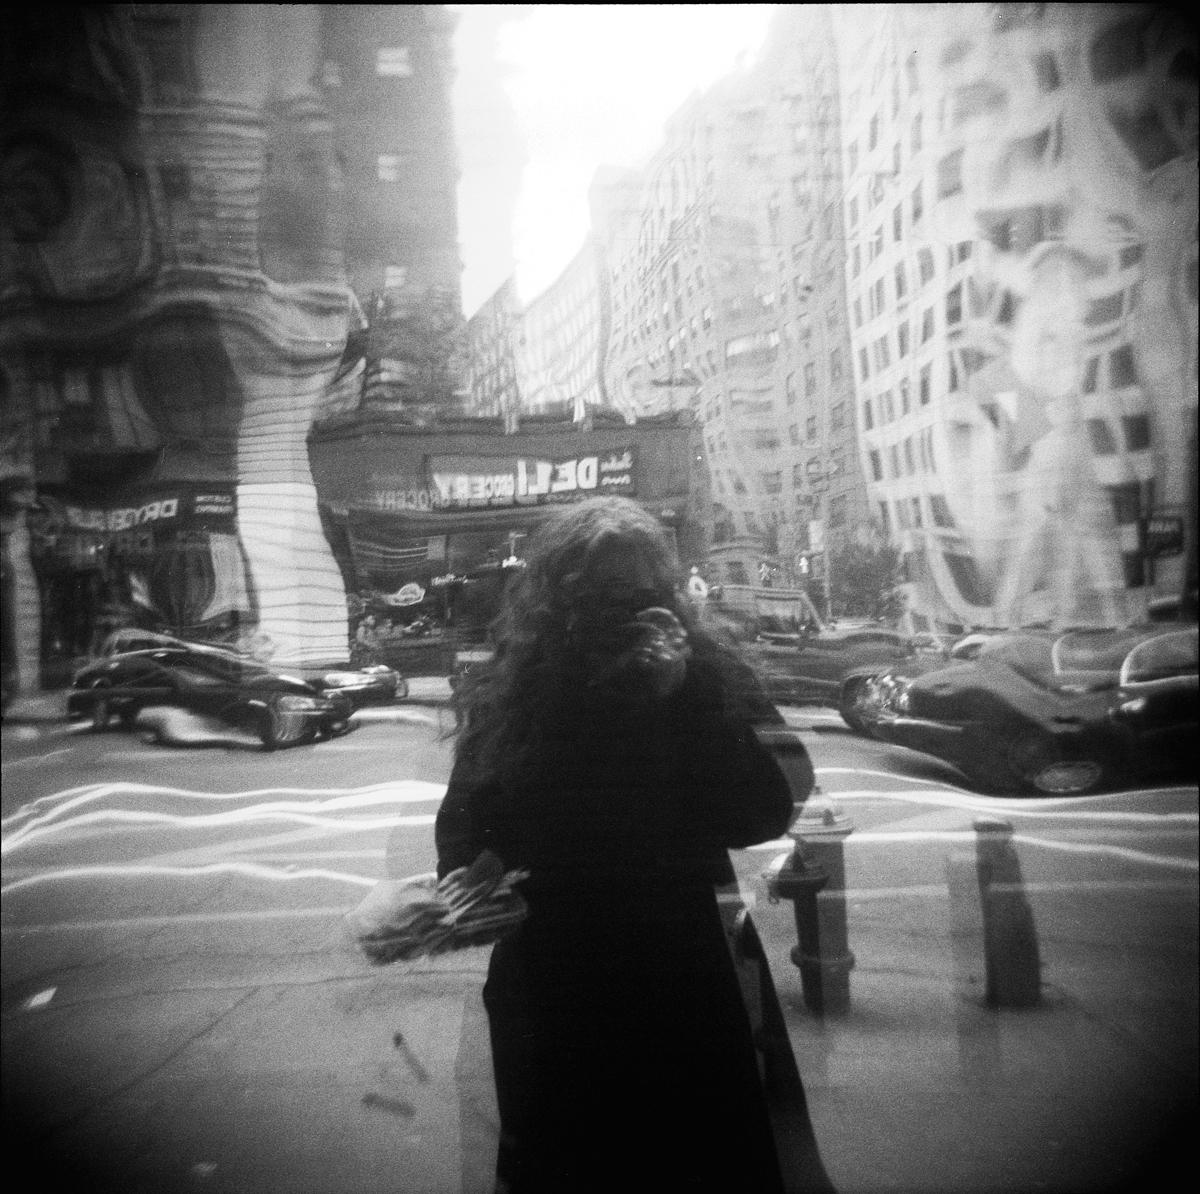 Self, 4th Avenue, New York City